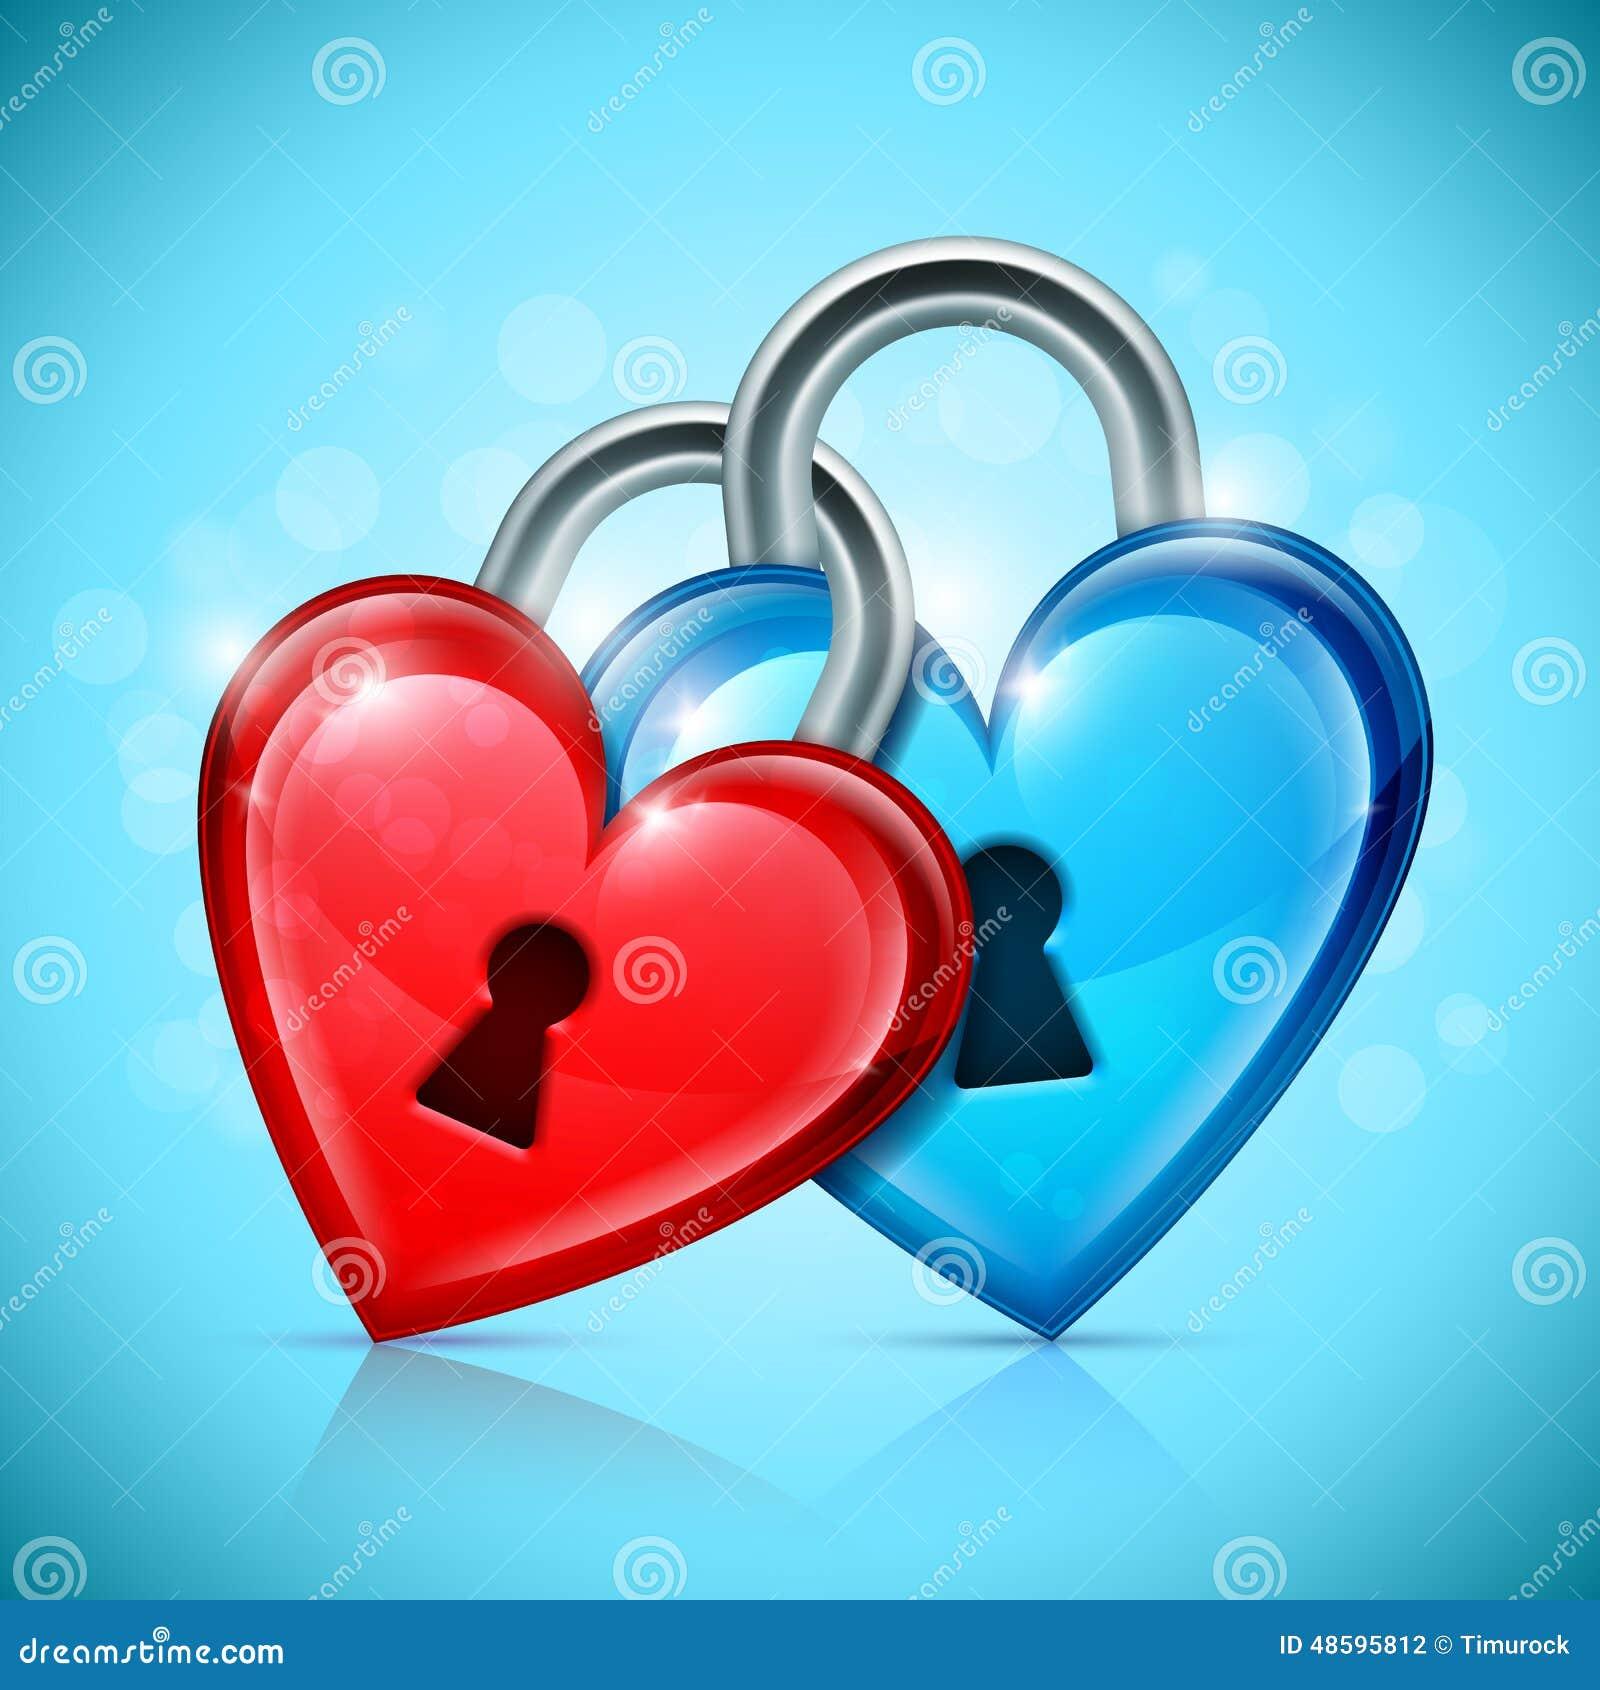 two heart locks stock vector illustration of blue metallic 48595812